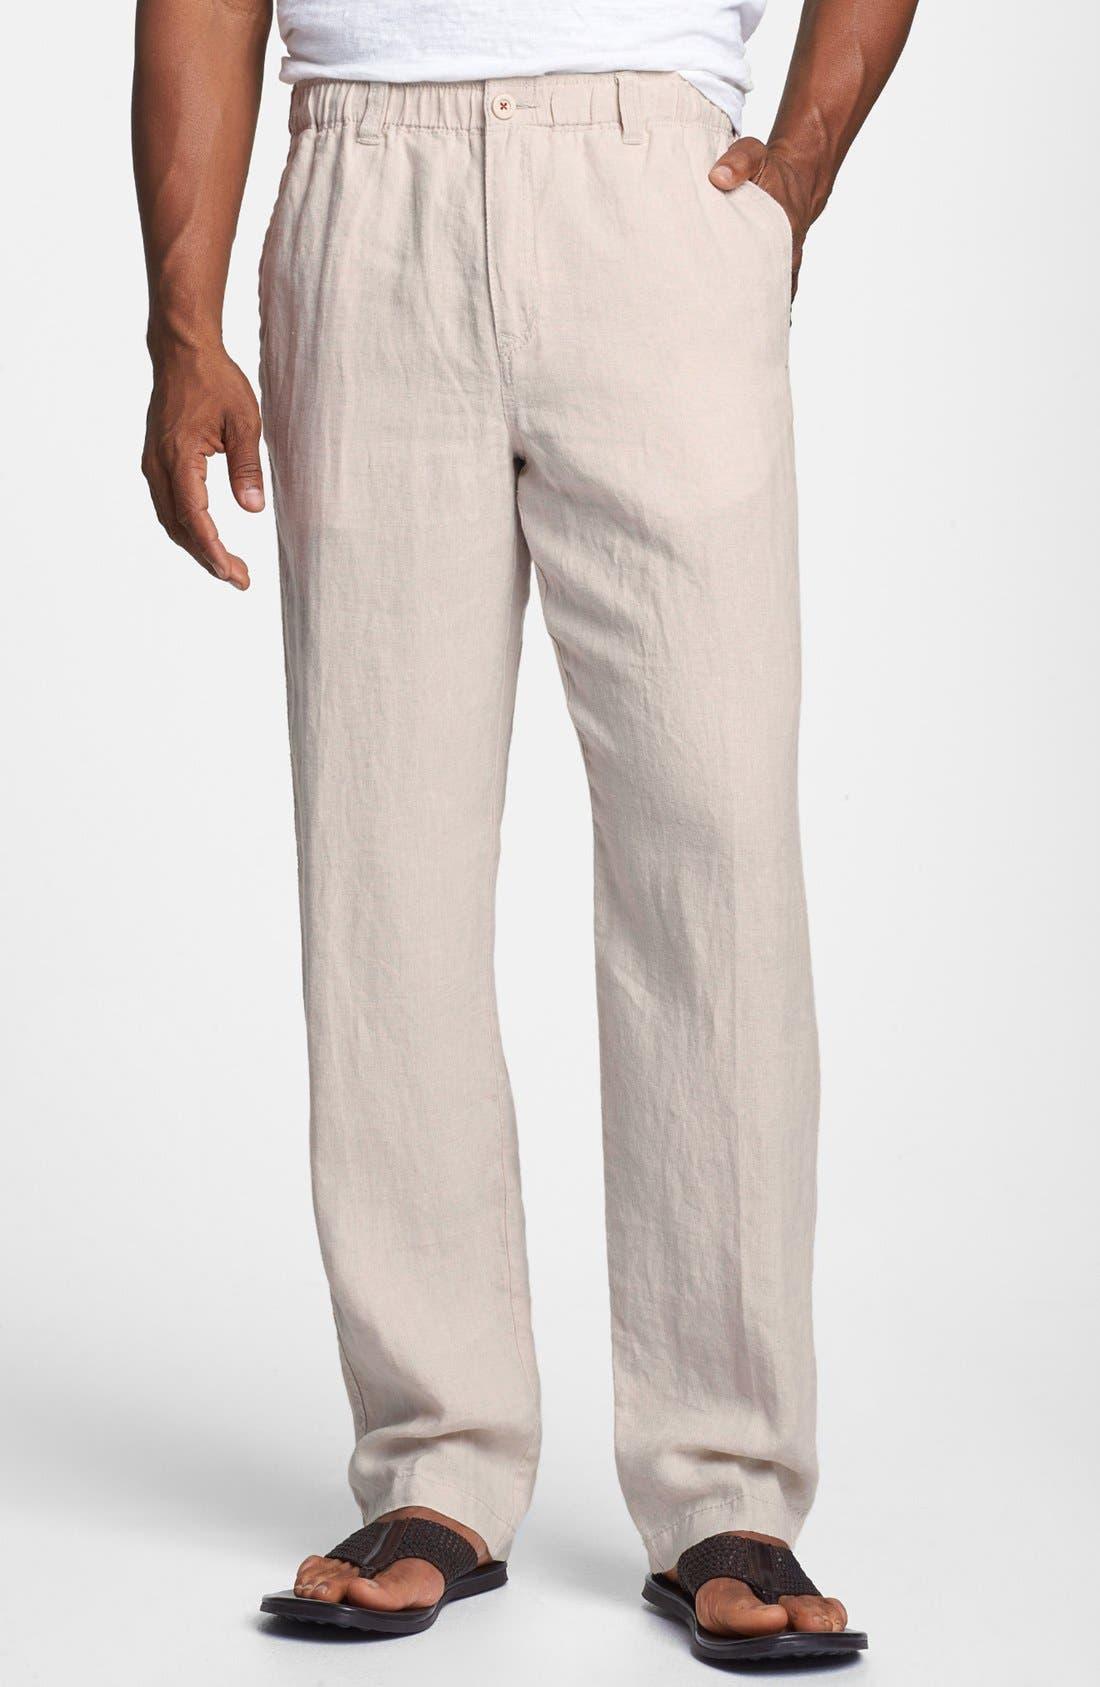 New Linen on the Beach Linen Pants,                             Main thumbnail 1, color,                             Natural Linen